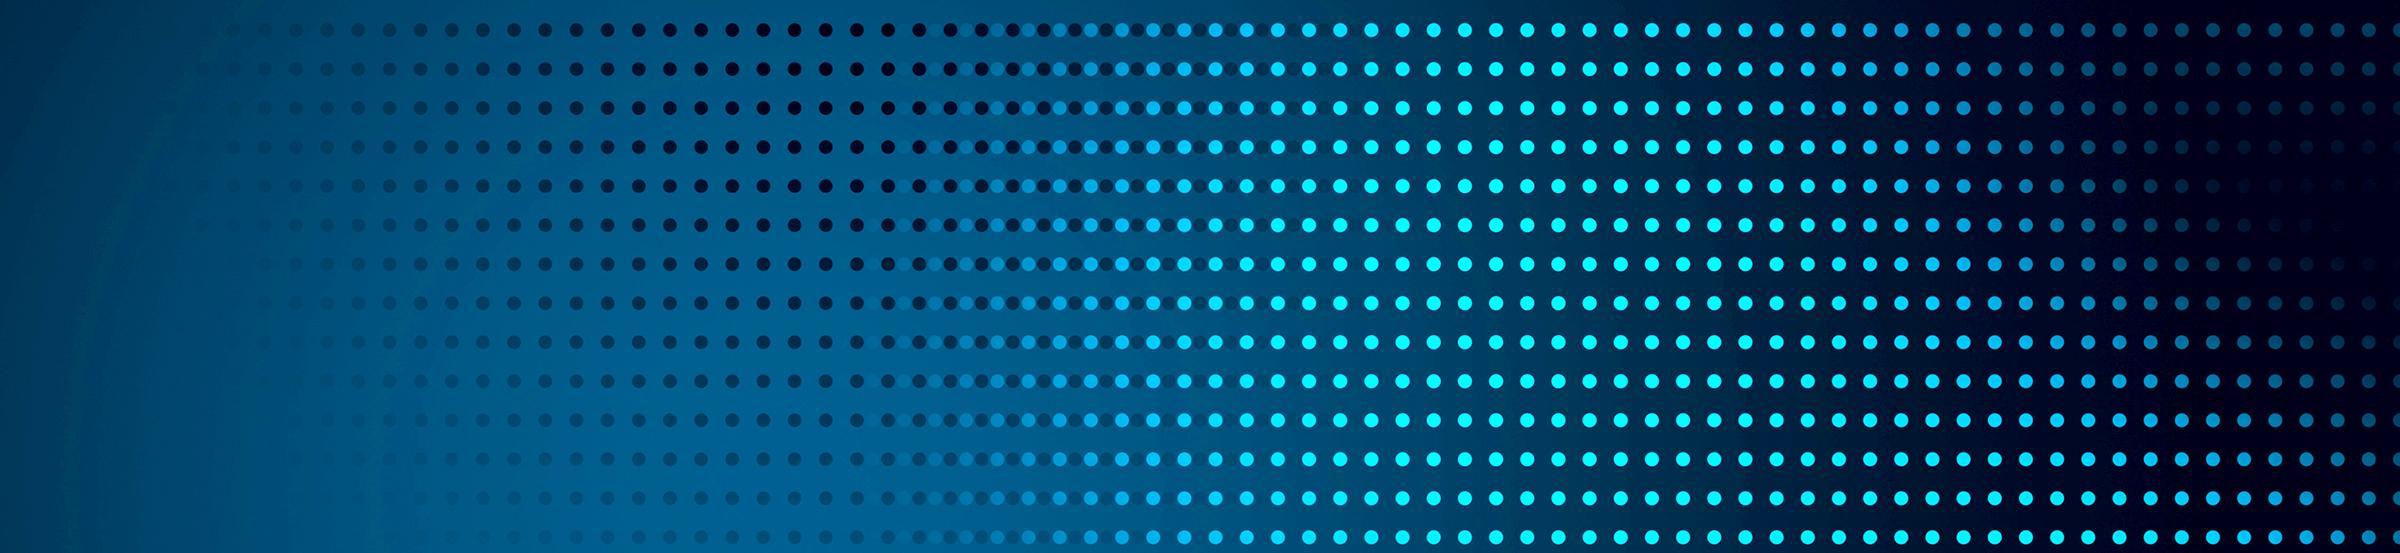 High tech design concept, background, dots